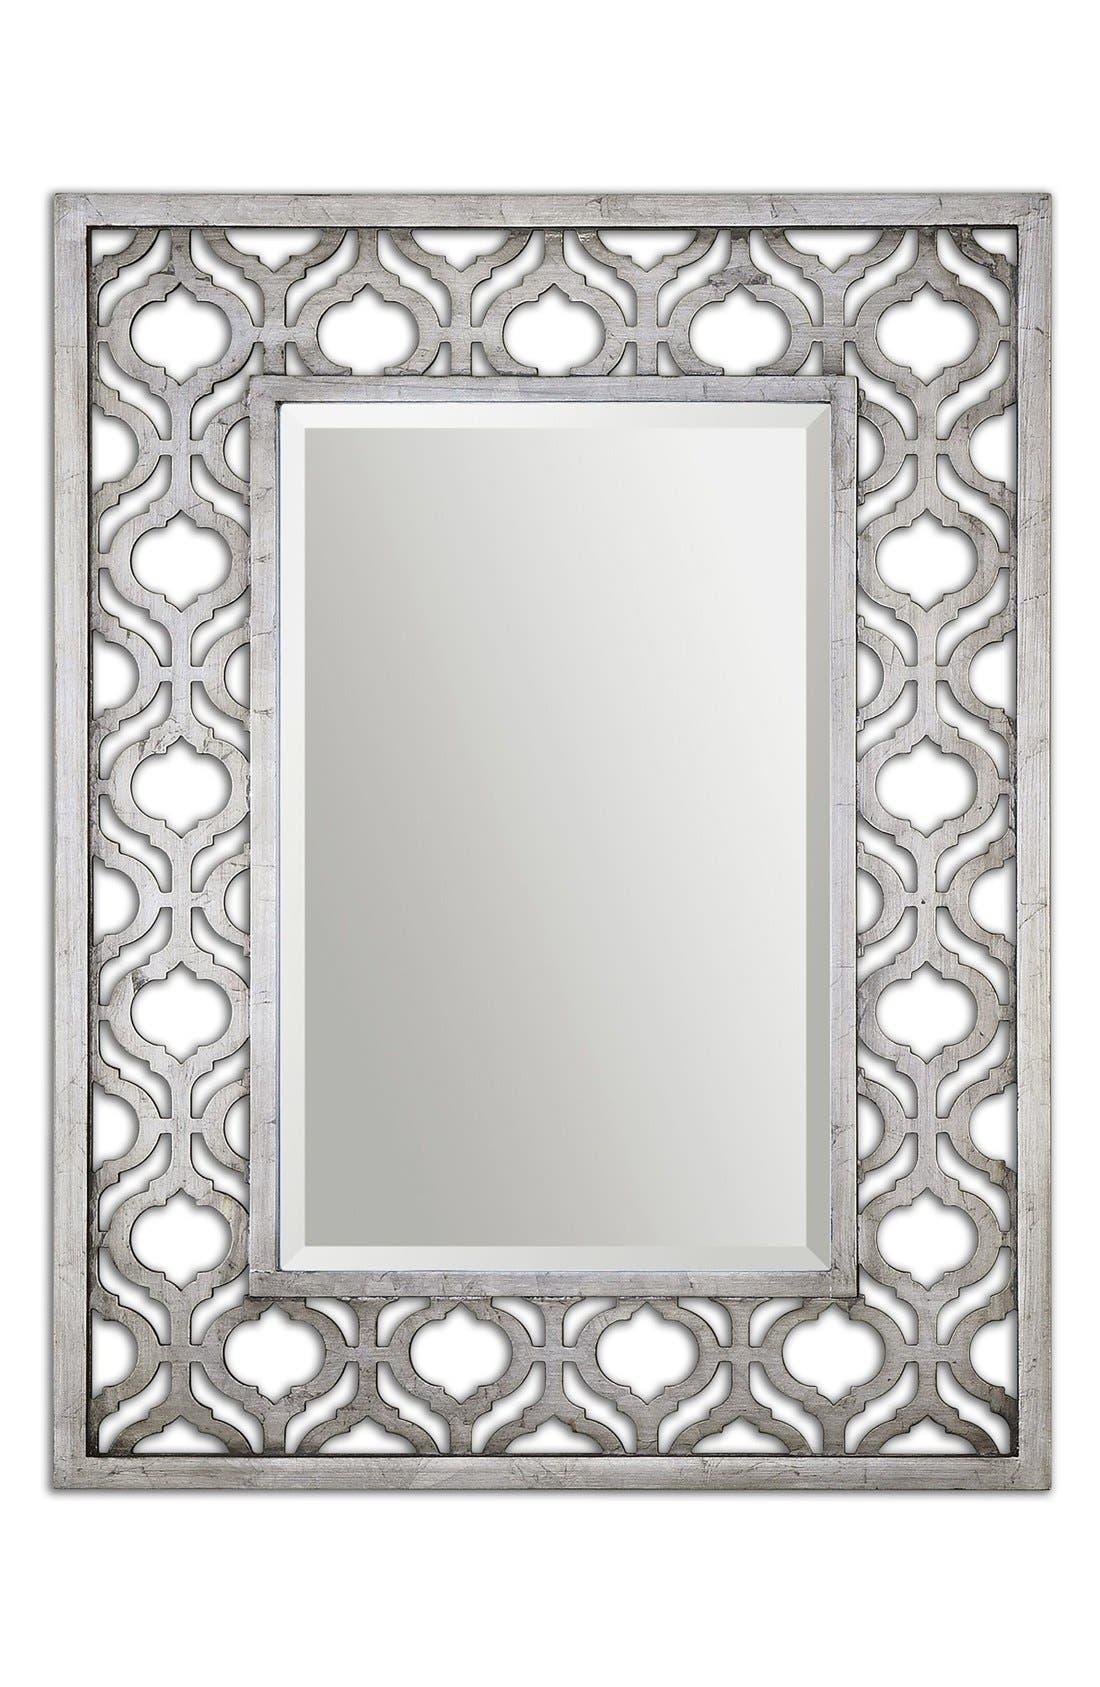 Main Image - Uttermost 'Sorbolo' Silver Leaf Mirror